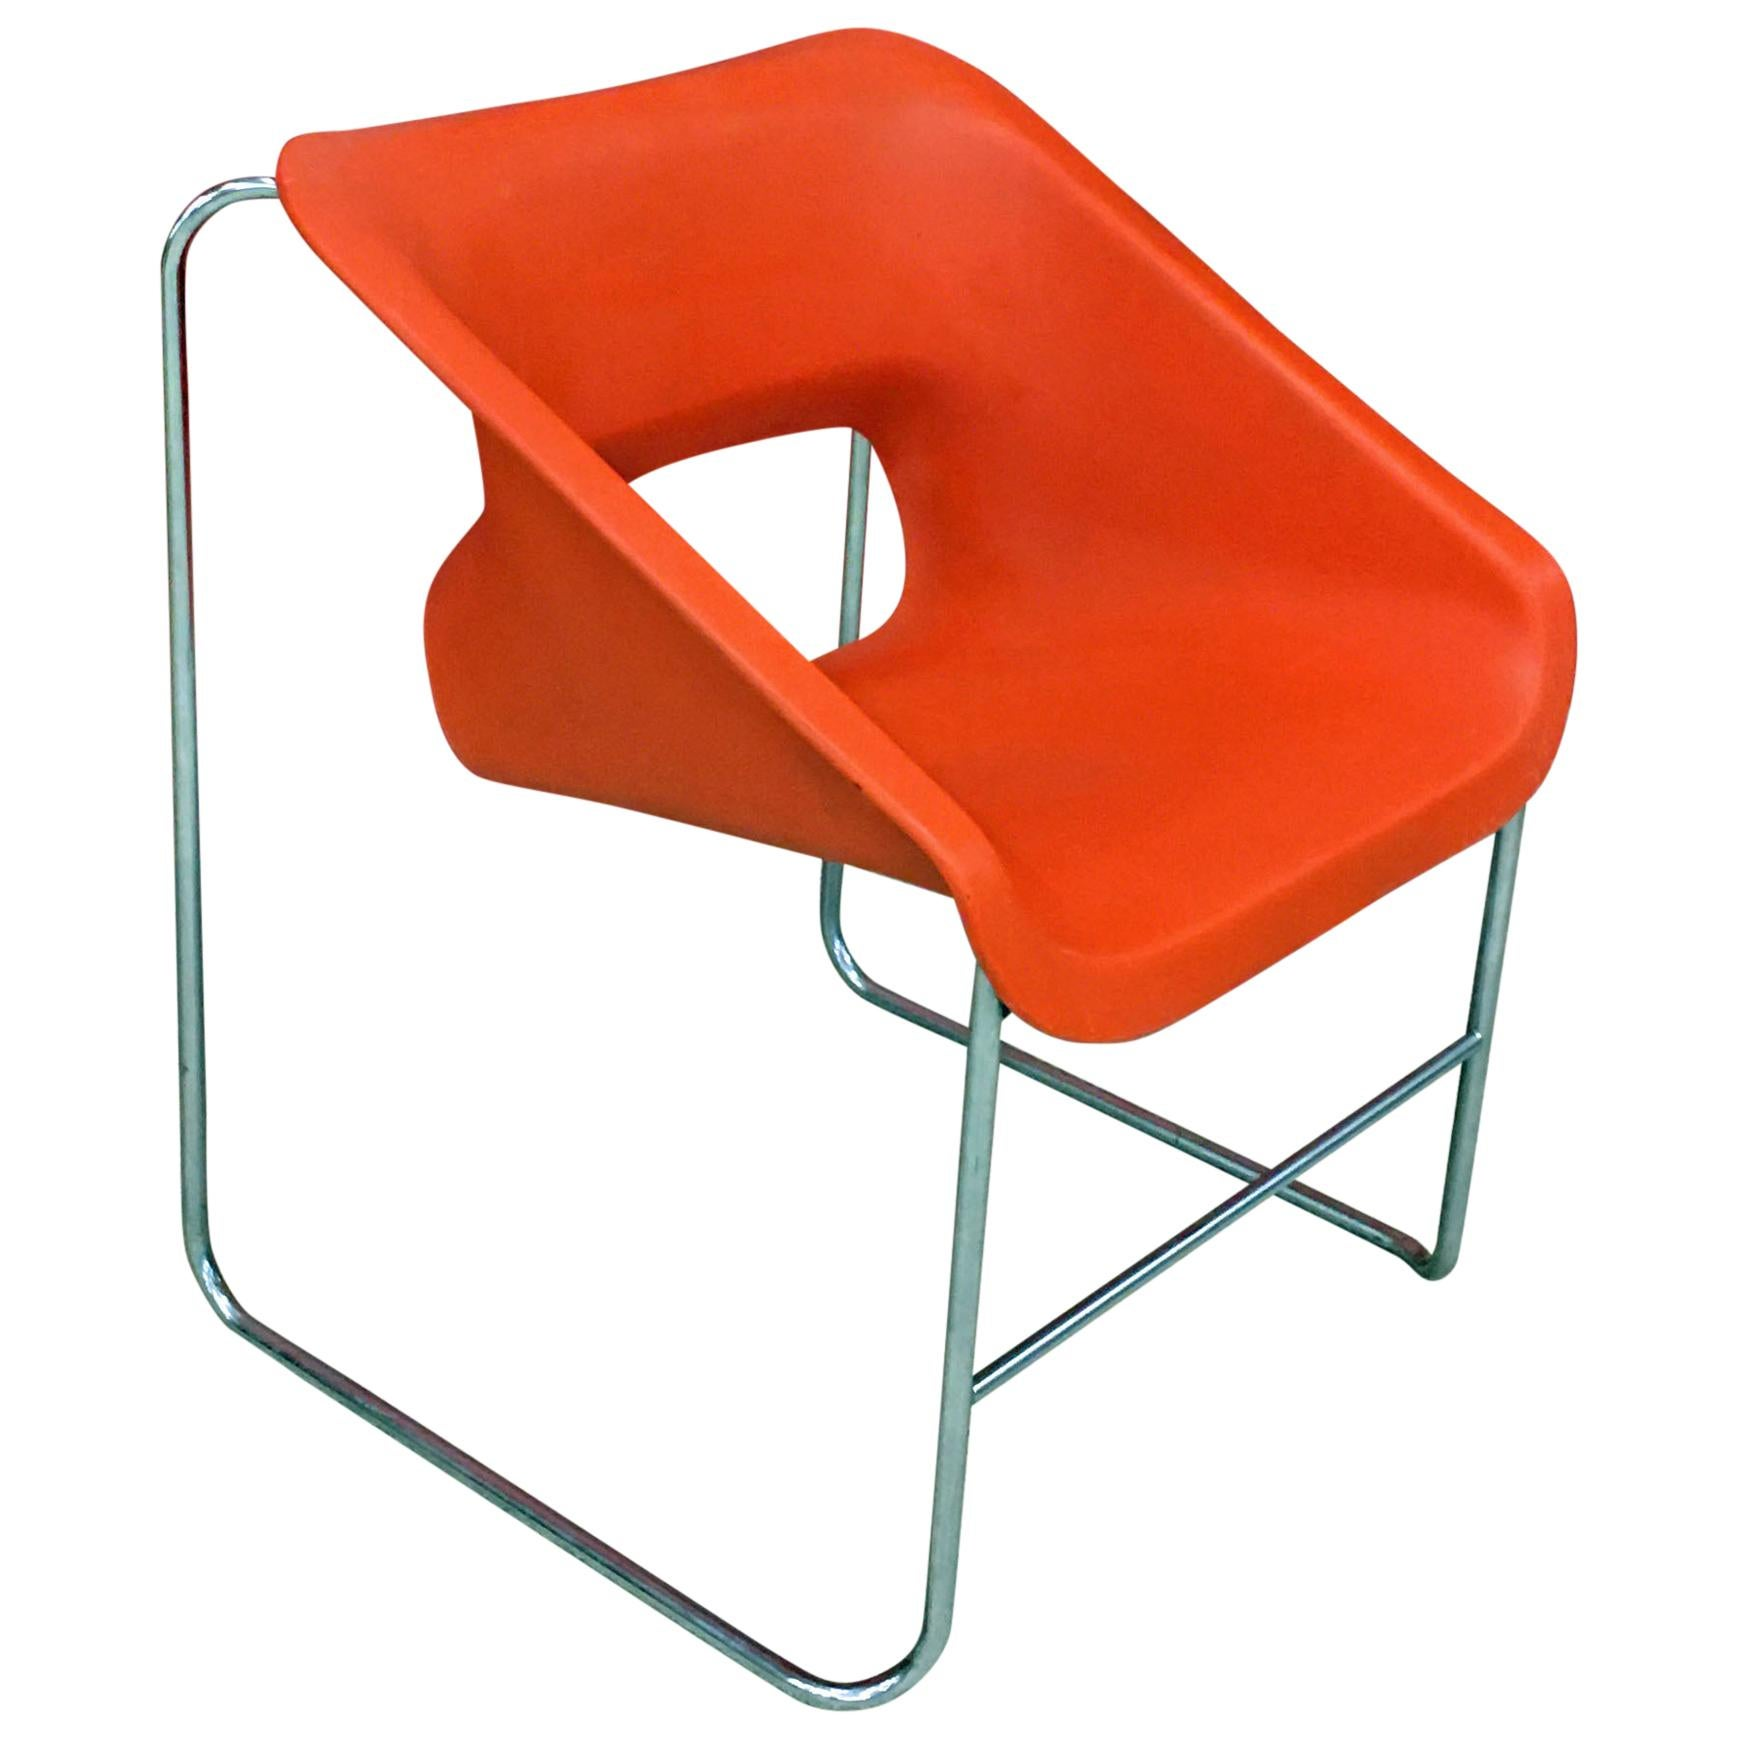 Vintage Lotus Chair designed for Artena by Paul Boulva, circa 1976